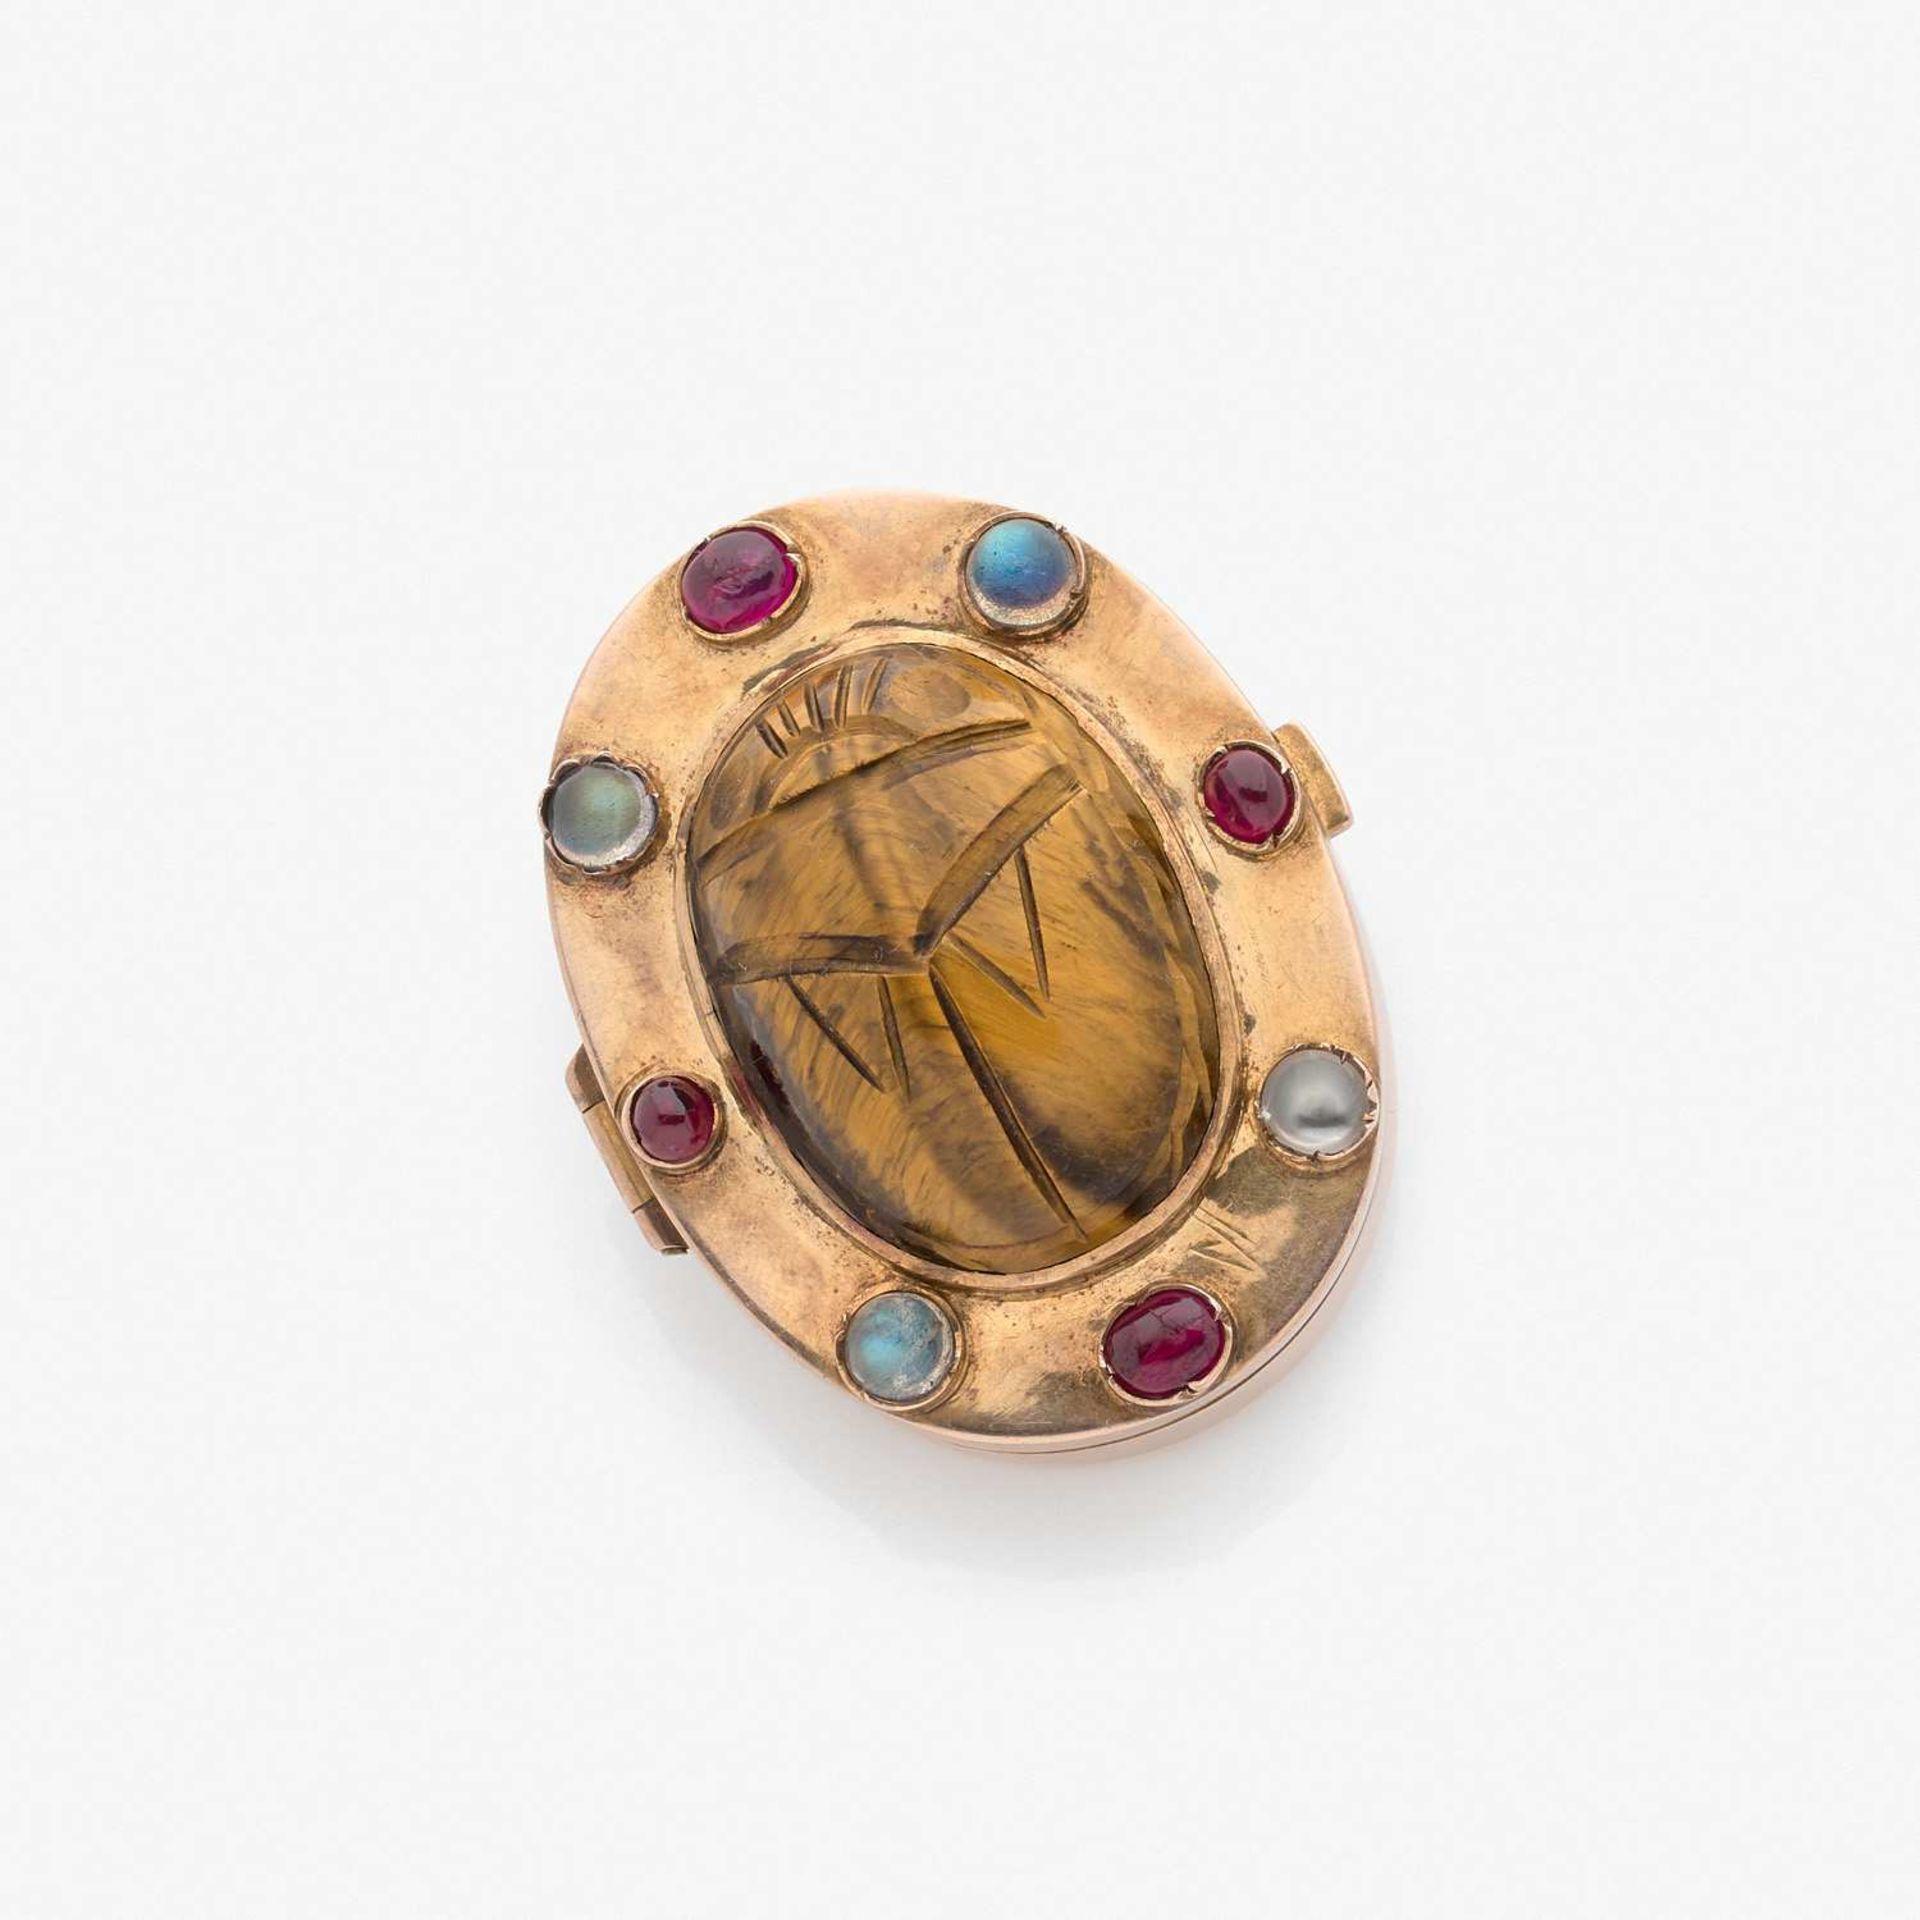 SAINT-PETERSBOURG - ANNEES 1860 - 1890 BOITE A PILULE SCARABEE Elle est de forme ovale en or rose